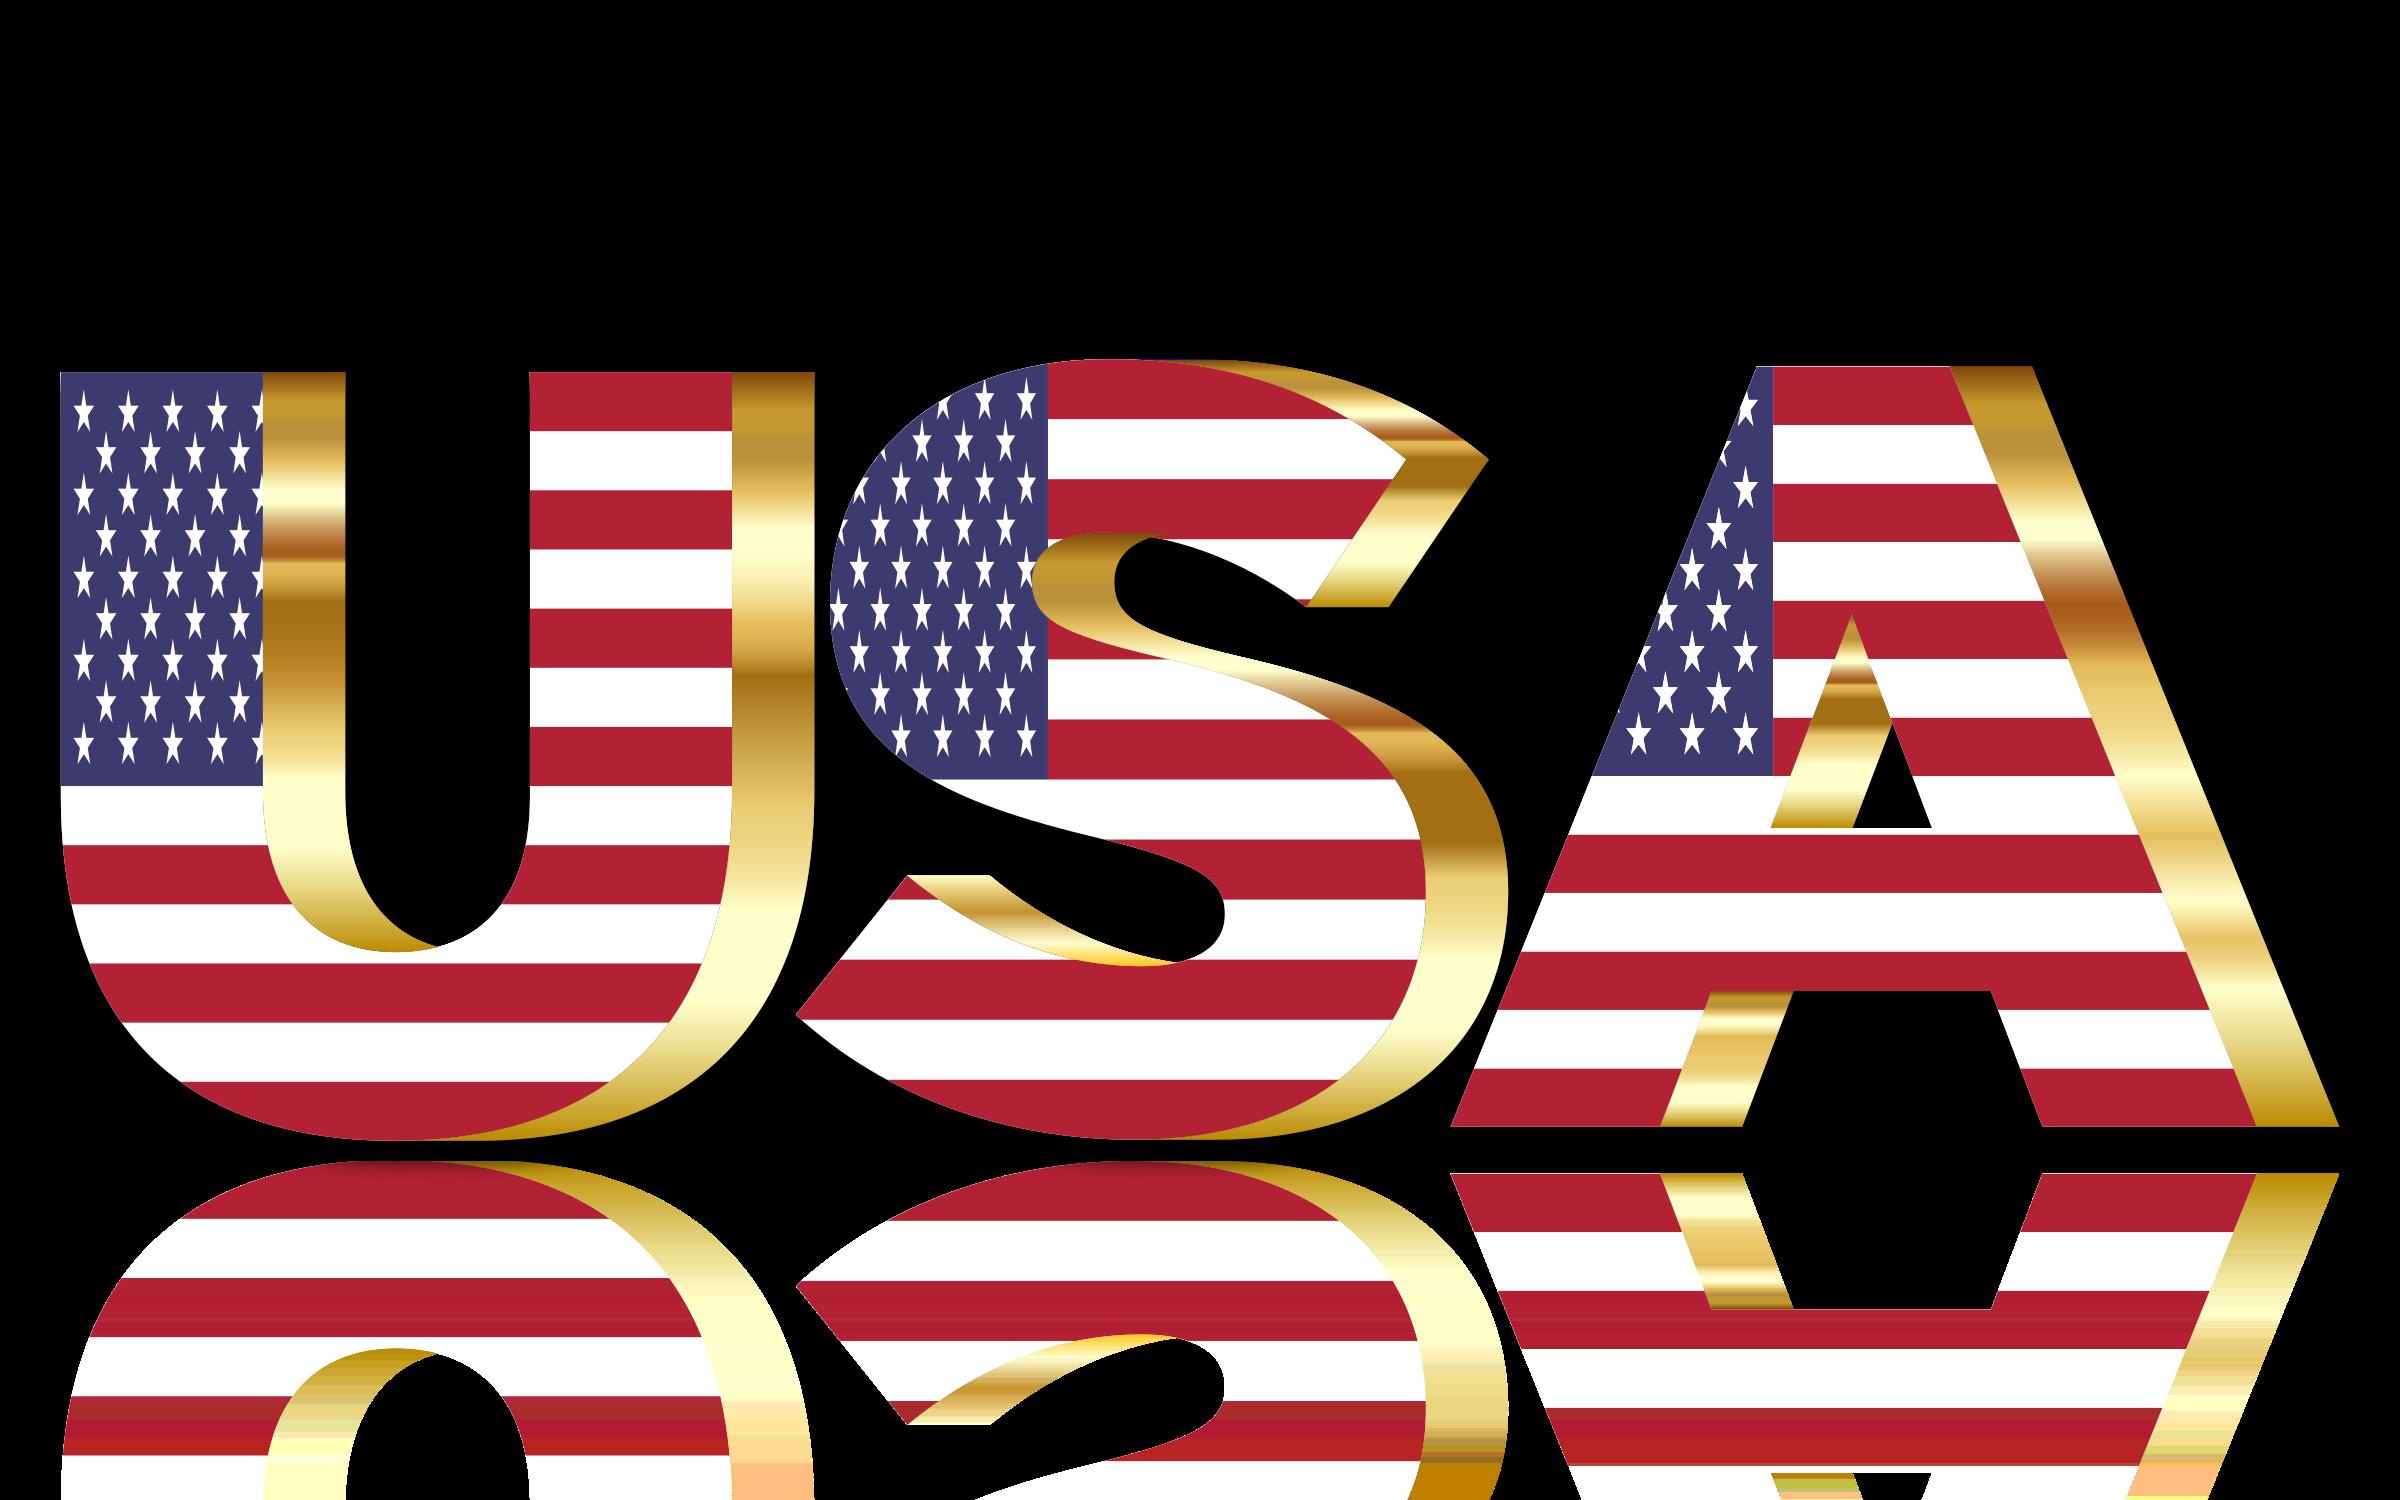 Usa American Flag America Patriotic Flags Buy Flag Anthem